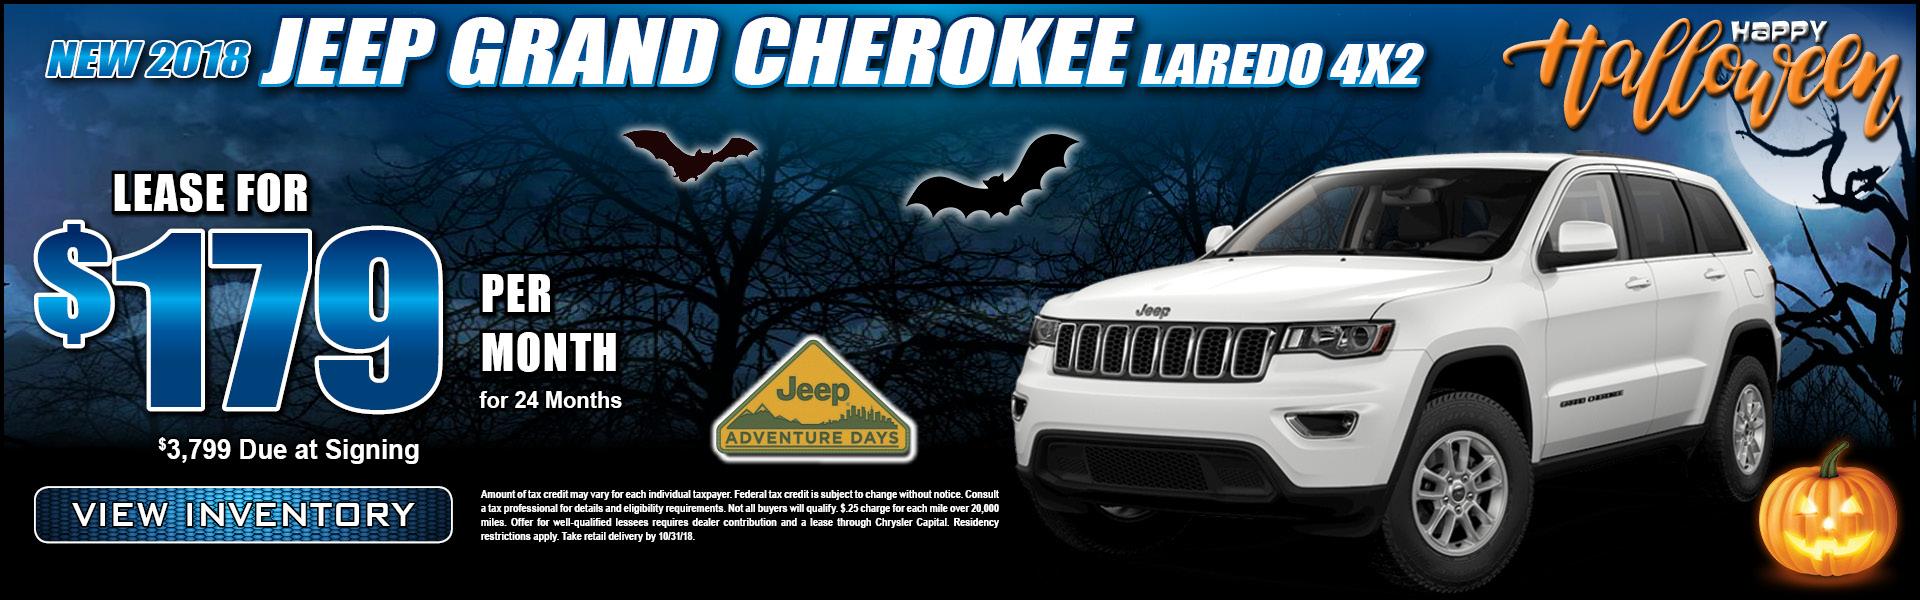 Jeep Grand Cherokee Laredo $179 Lease